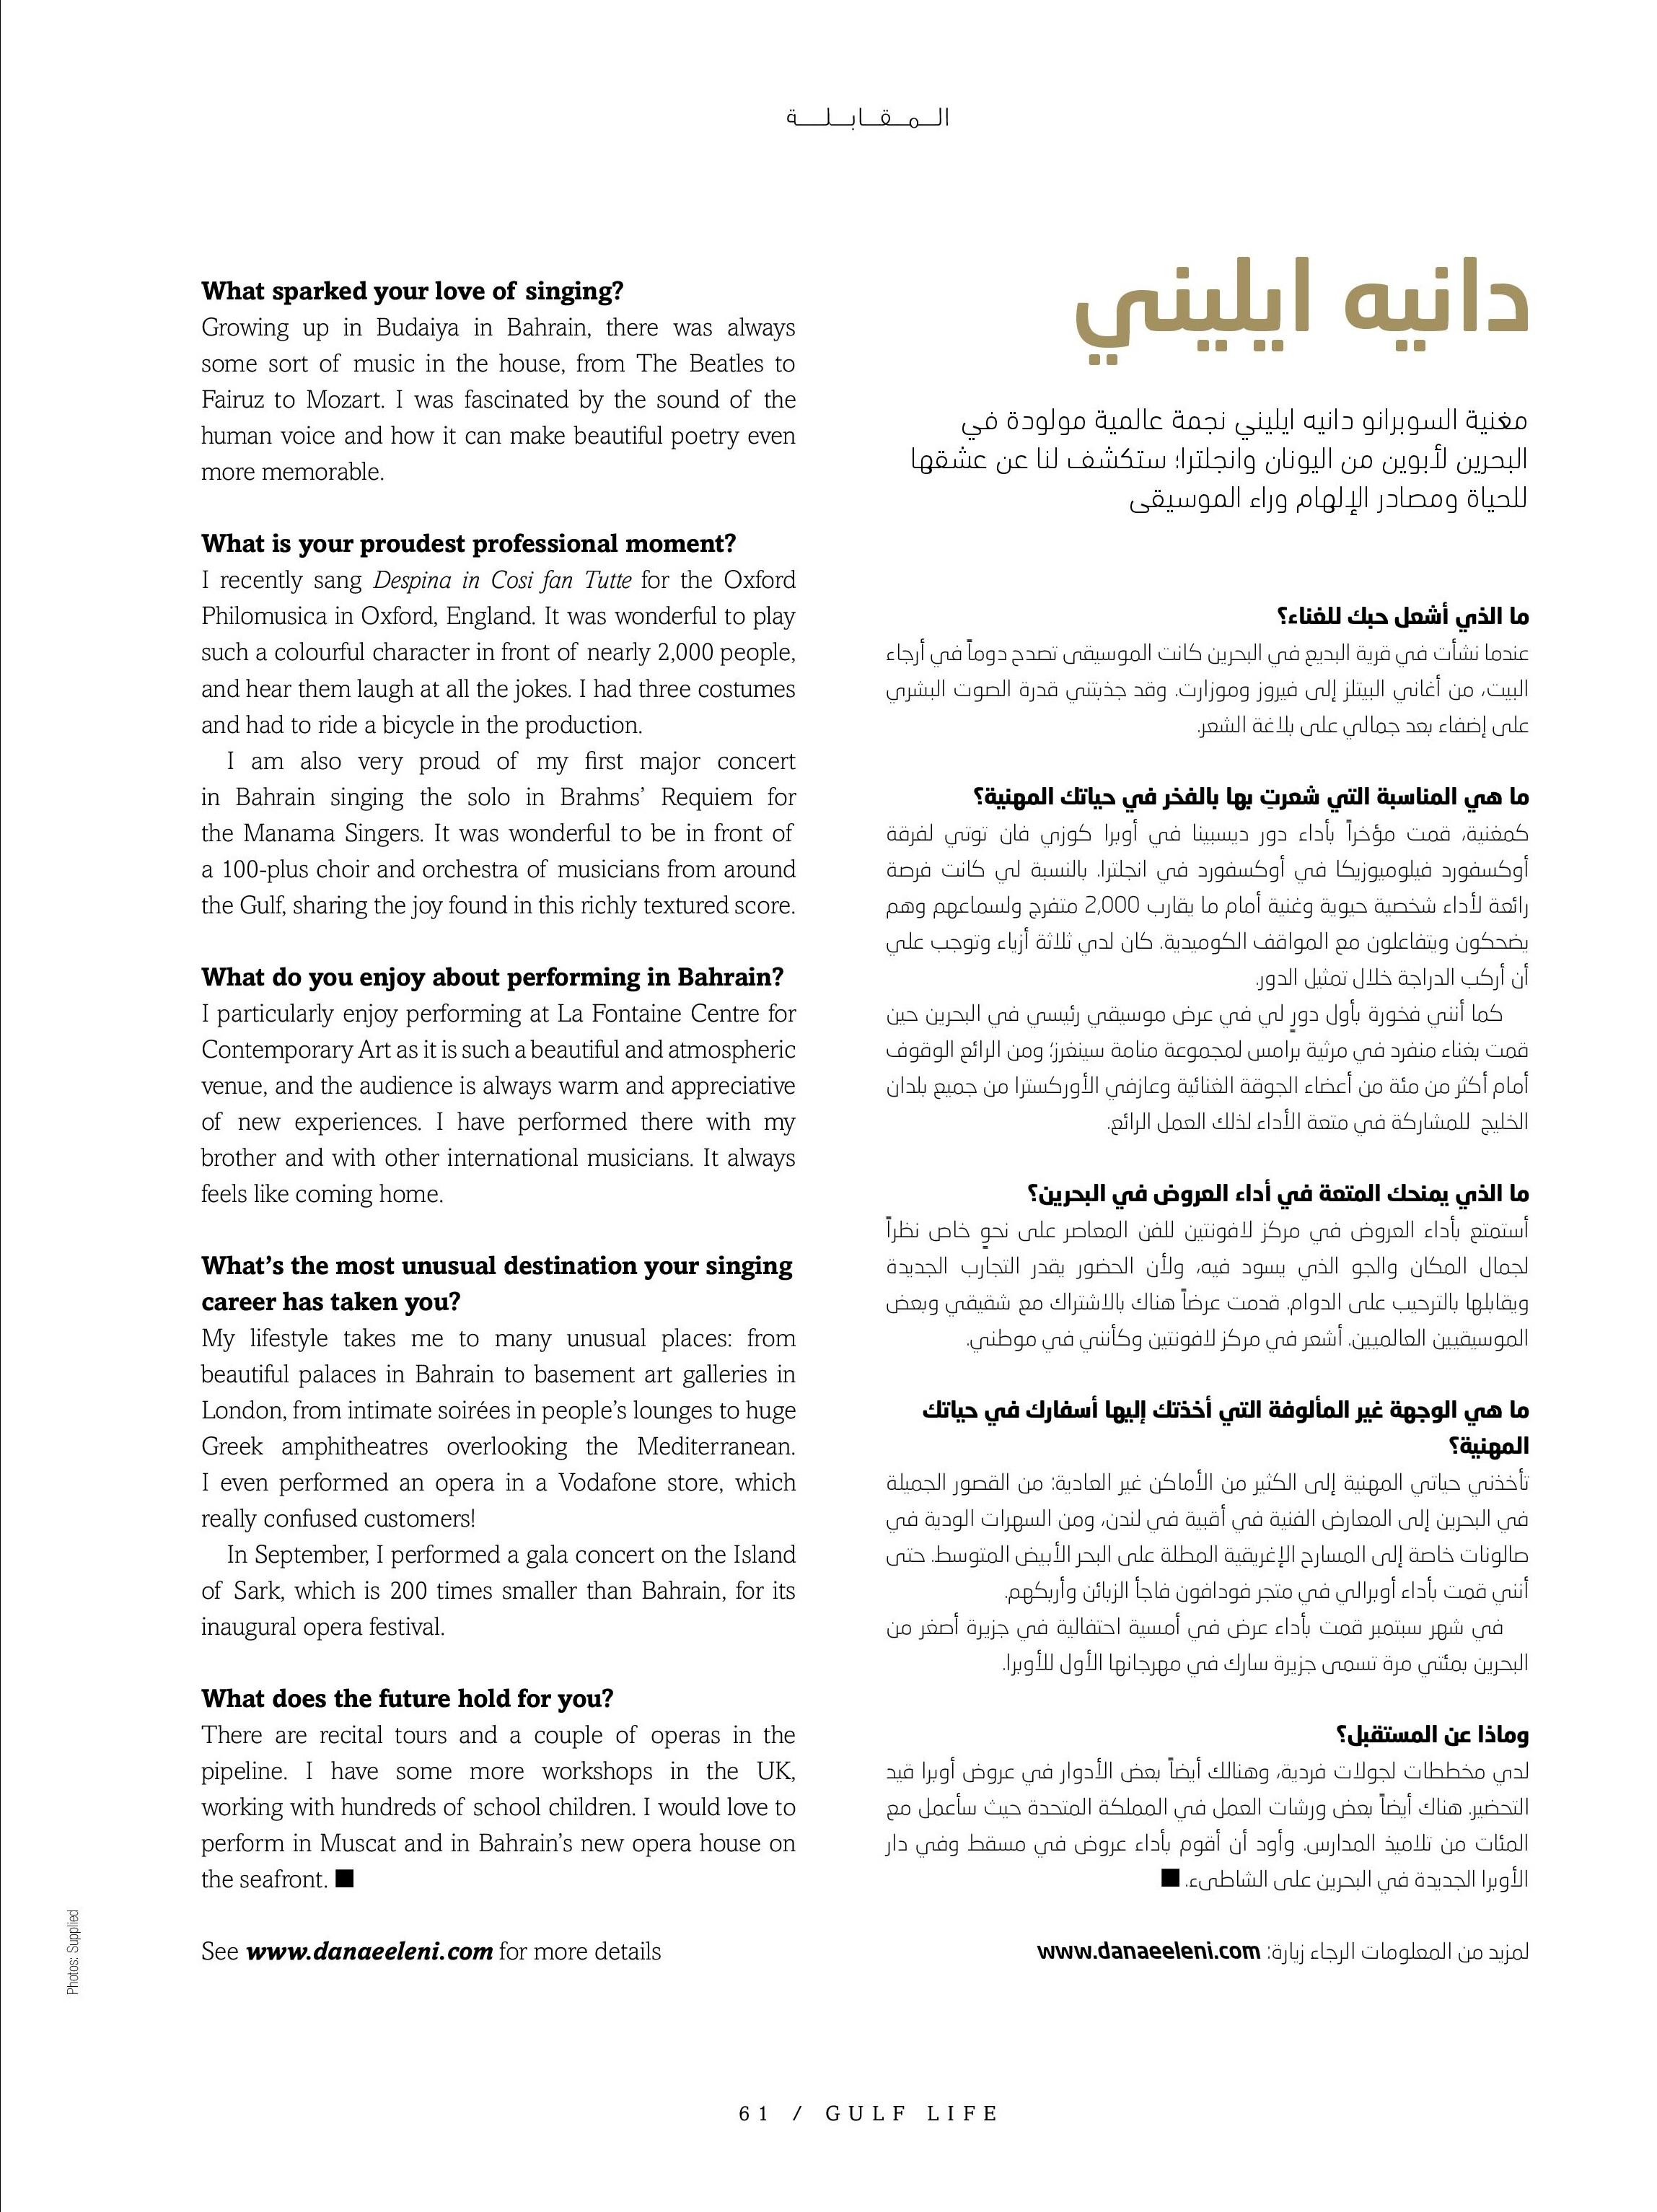 Danae Eleni Gulf Life Interview-page-61.jpg